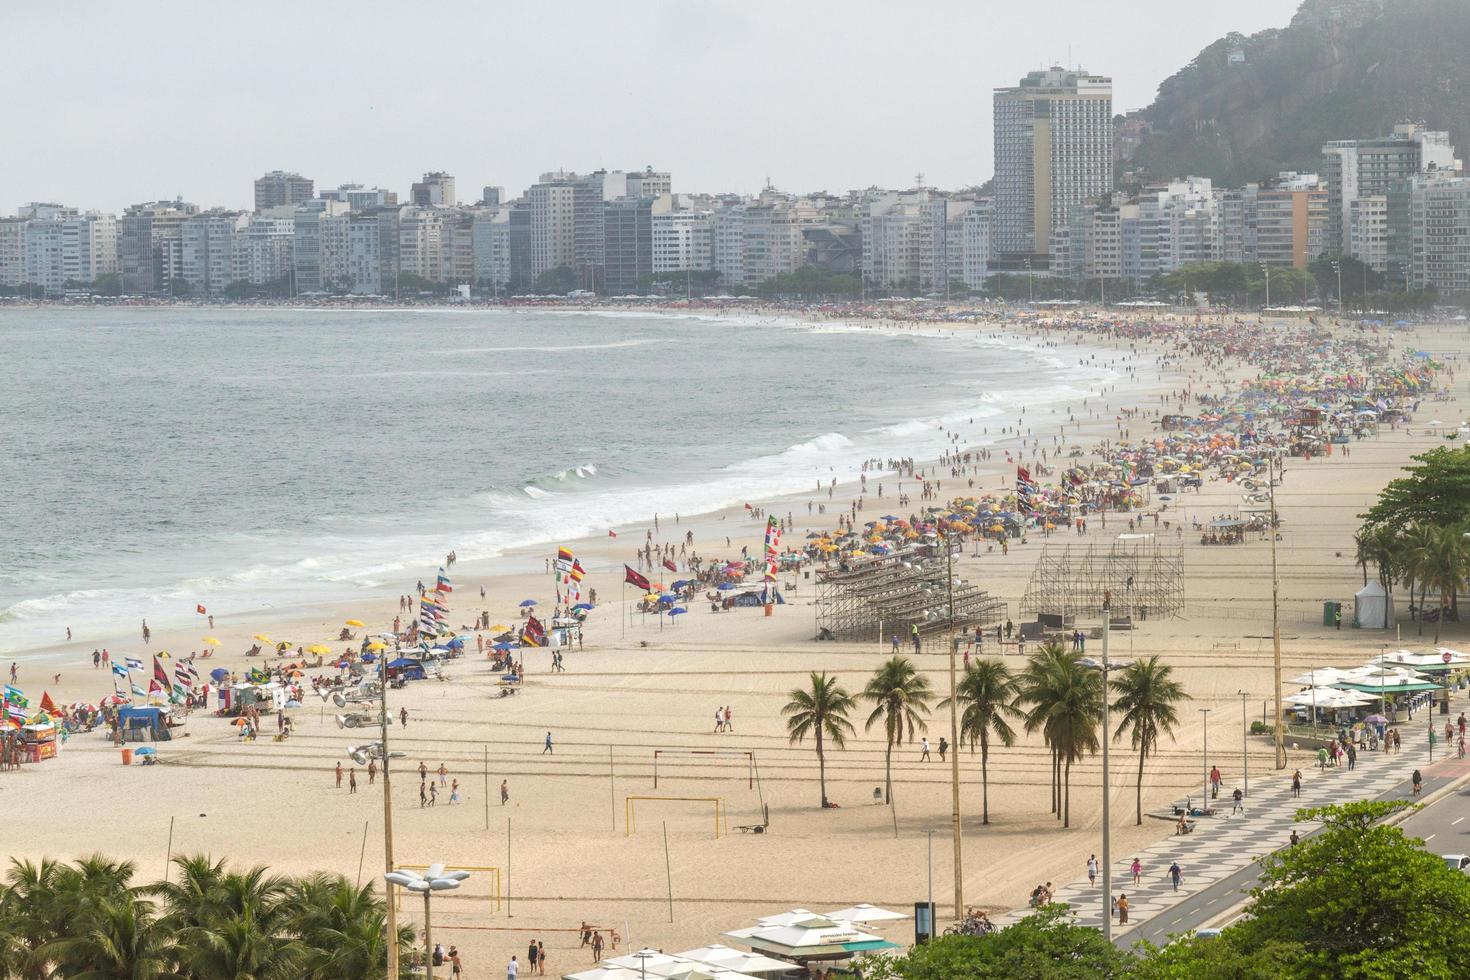 Leme beach à copacabana, rio de janeiro, brésil photo